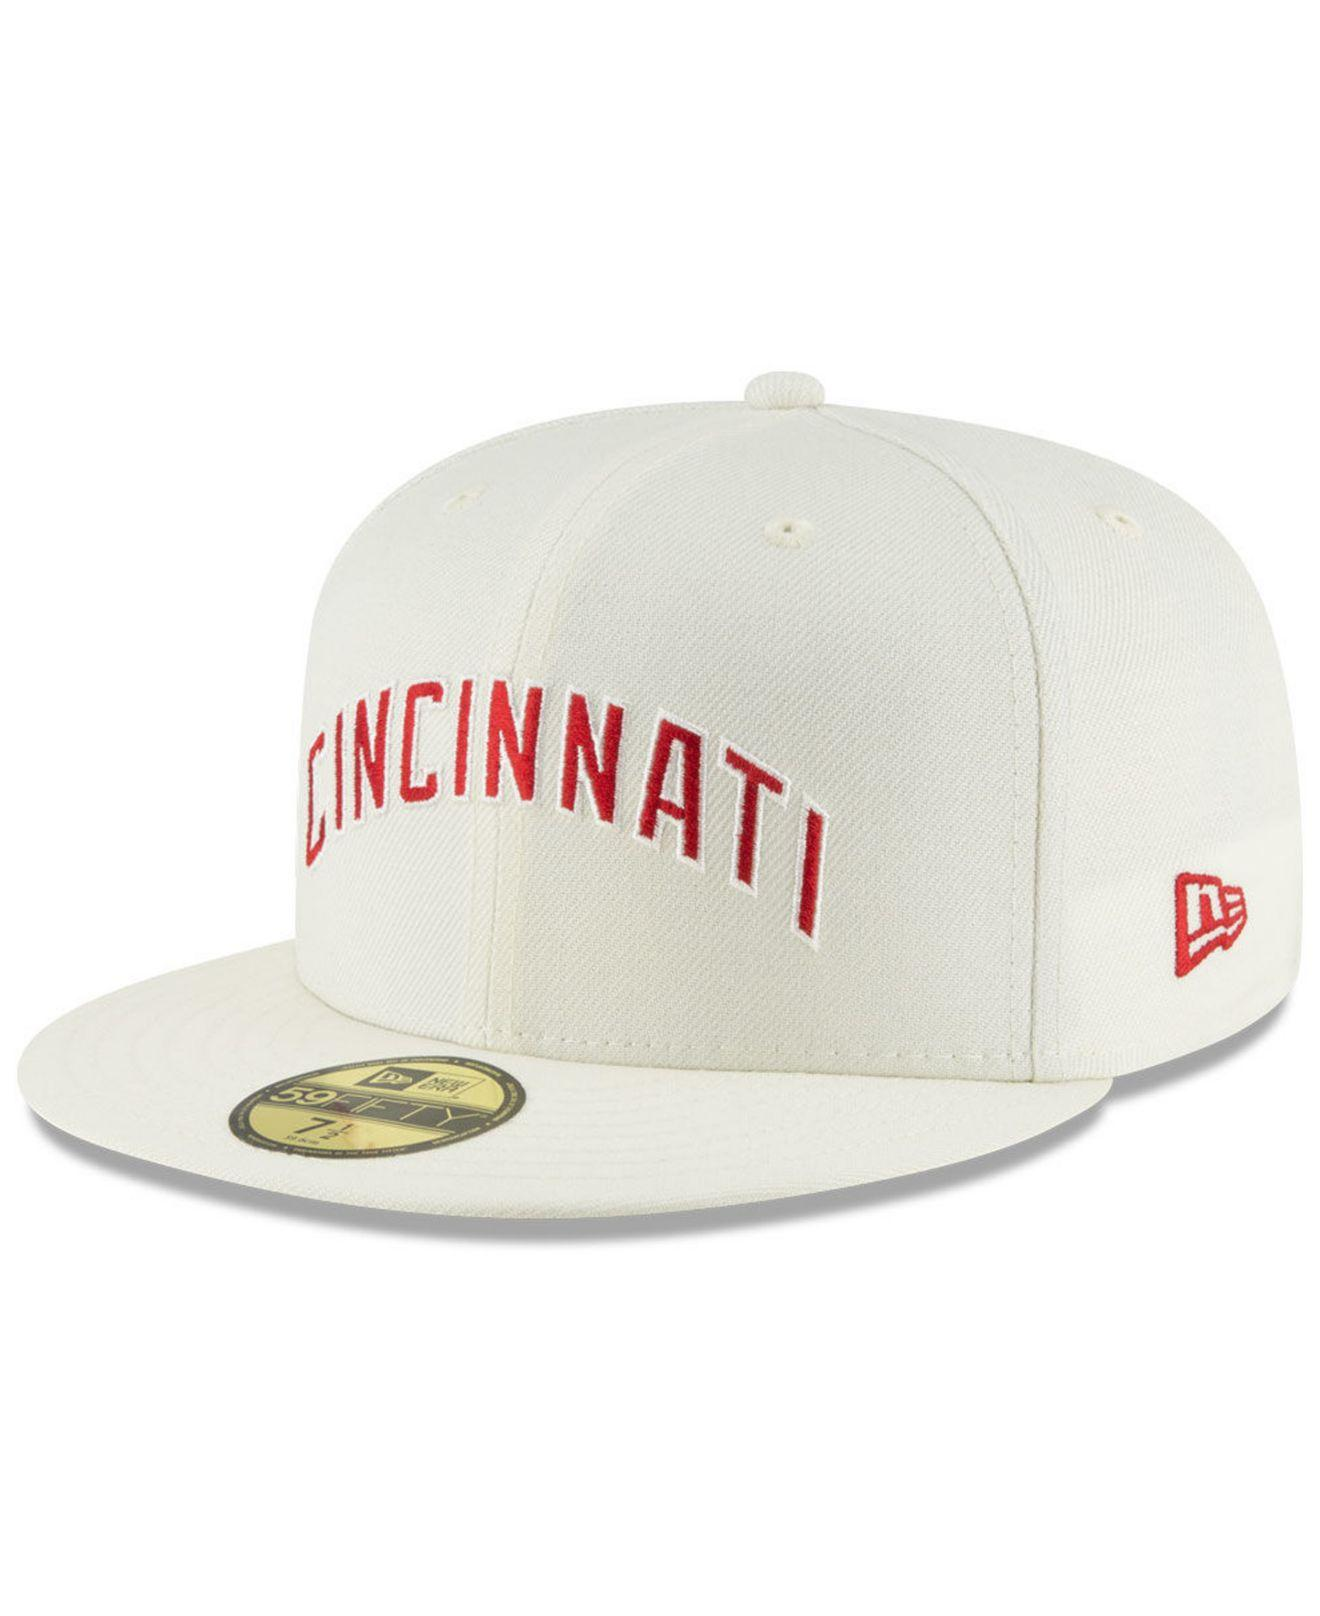 1fc56b1274e Lyst - KTZ Cincinnati Reds Vintage World Series Patch 59fifty Cap ...